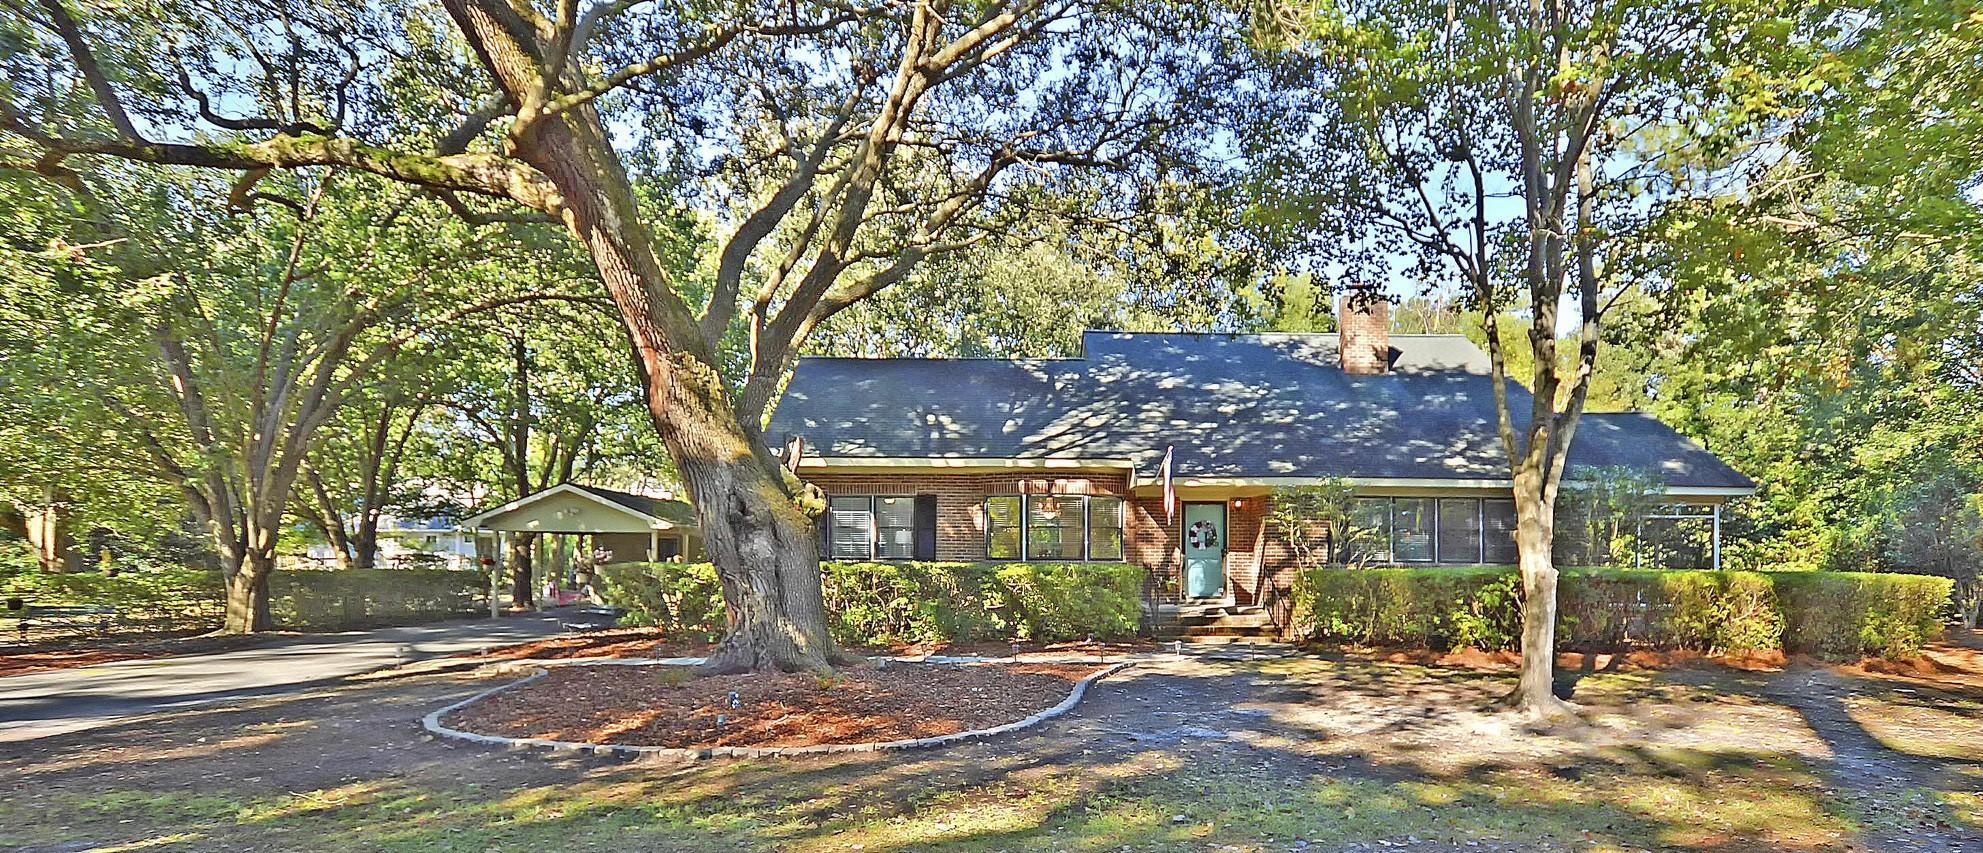 Edgewater Park Homes For Sale - 1356 Emory, Charleston, SC - 16